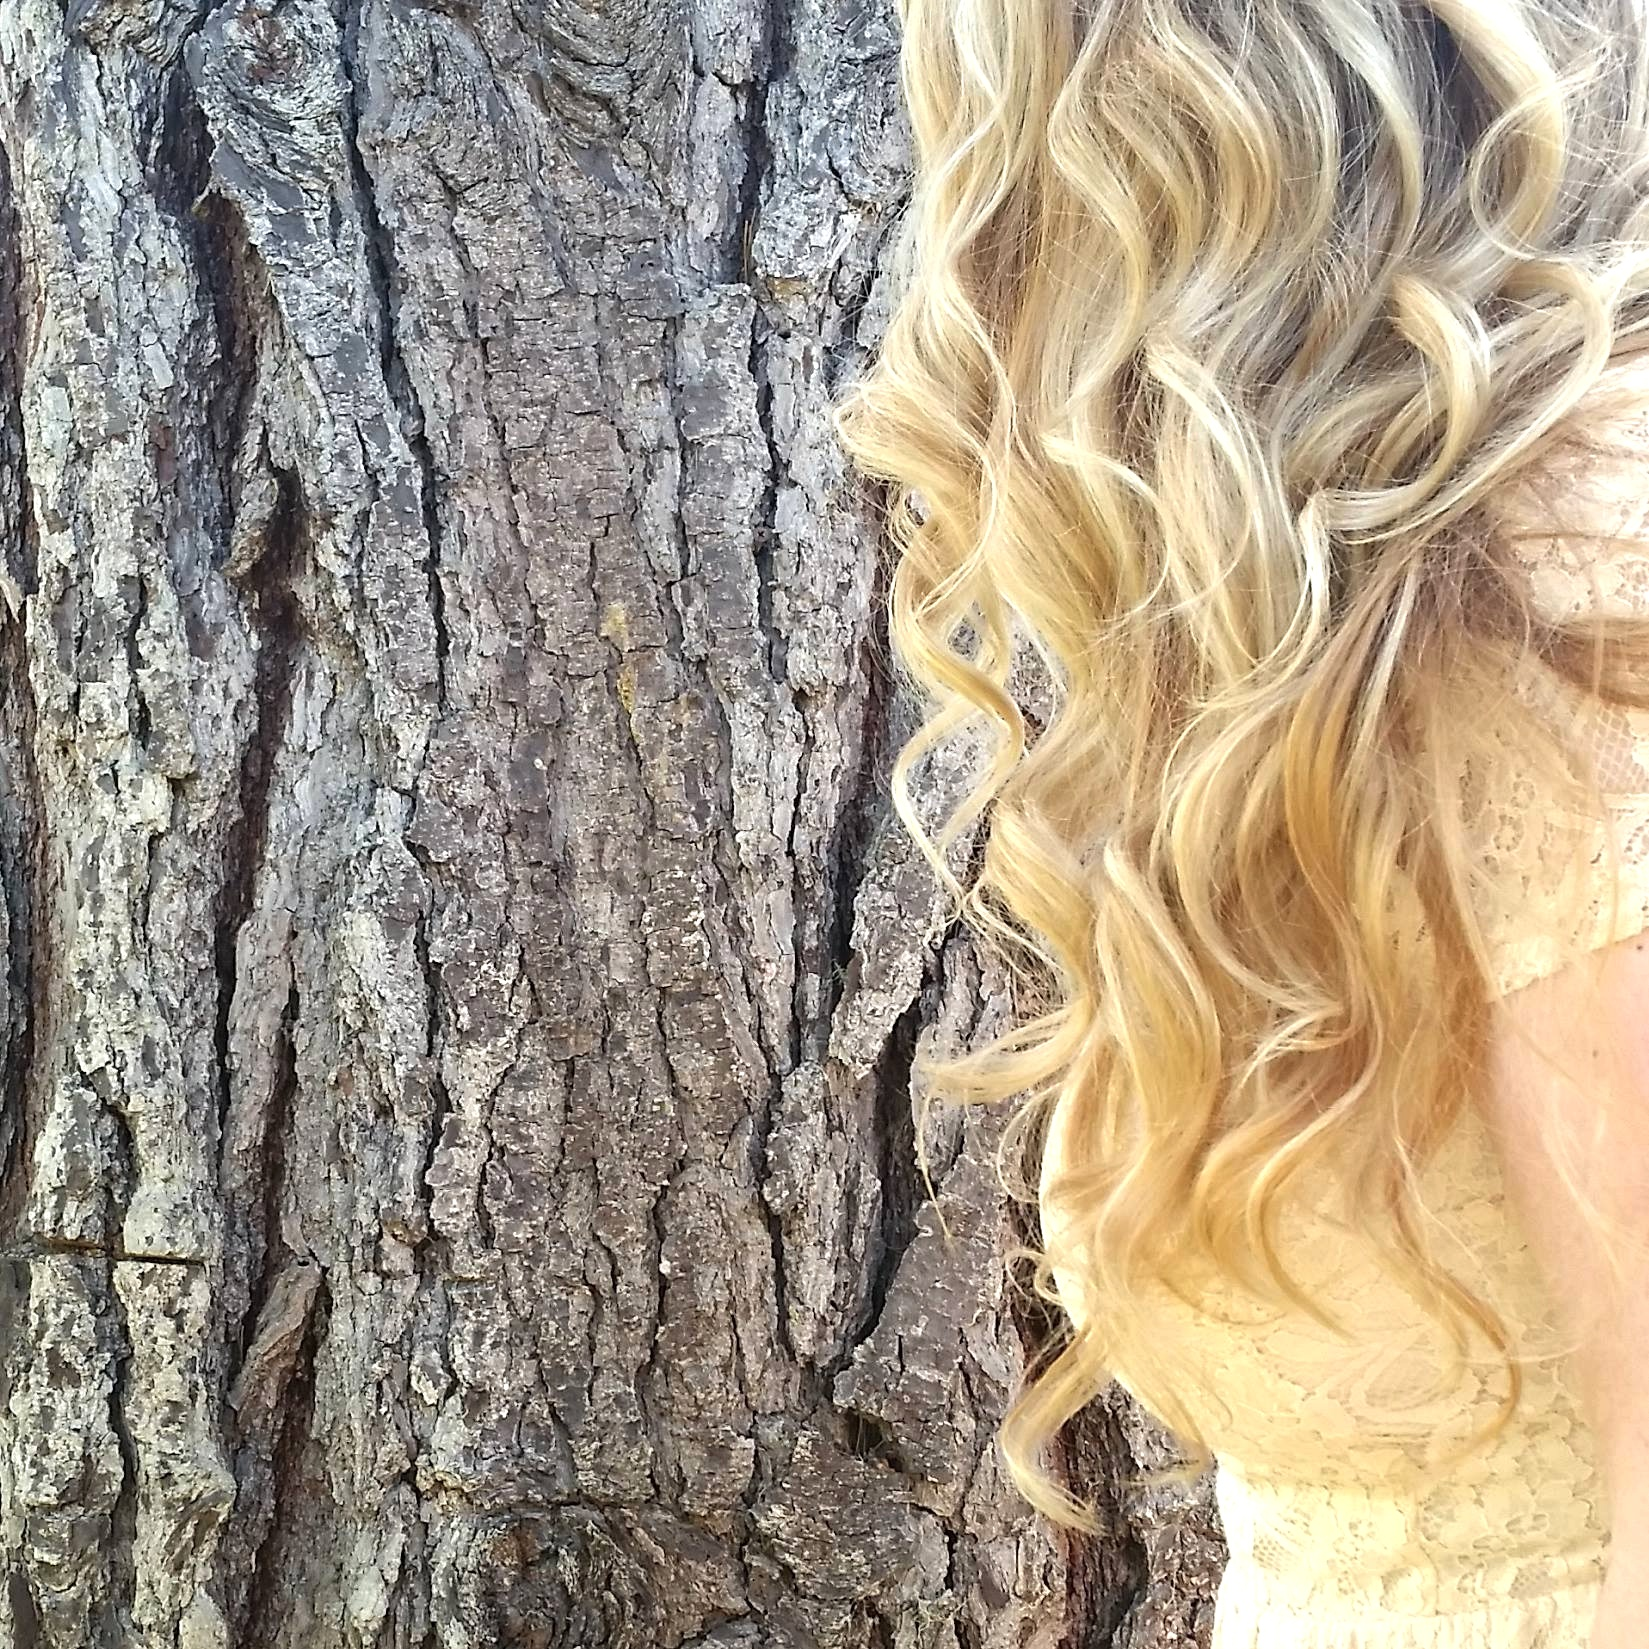 Hair+By+Amy+Paz%2C+Monterey+Ca